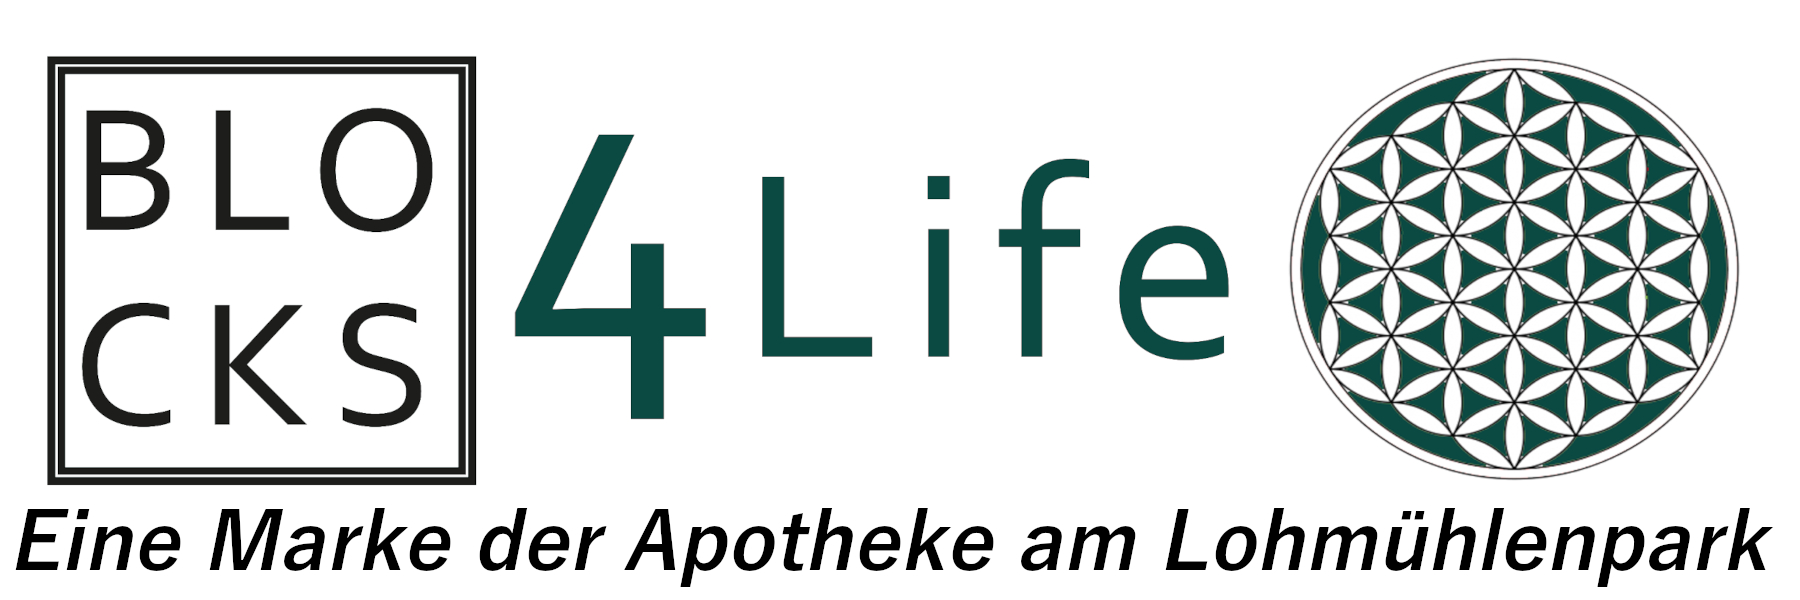 Logo der Apotheke am Lohmühlenpark